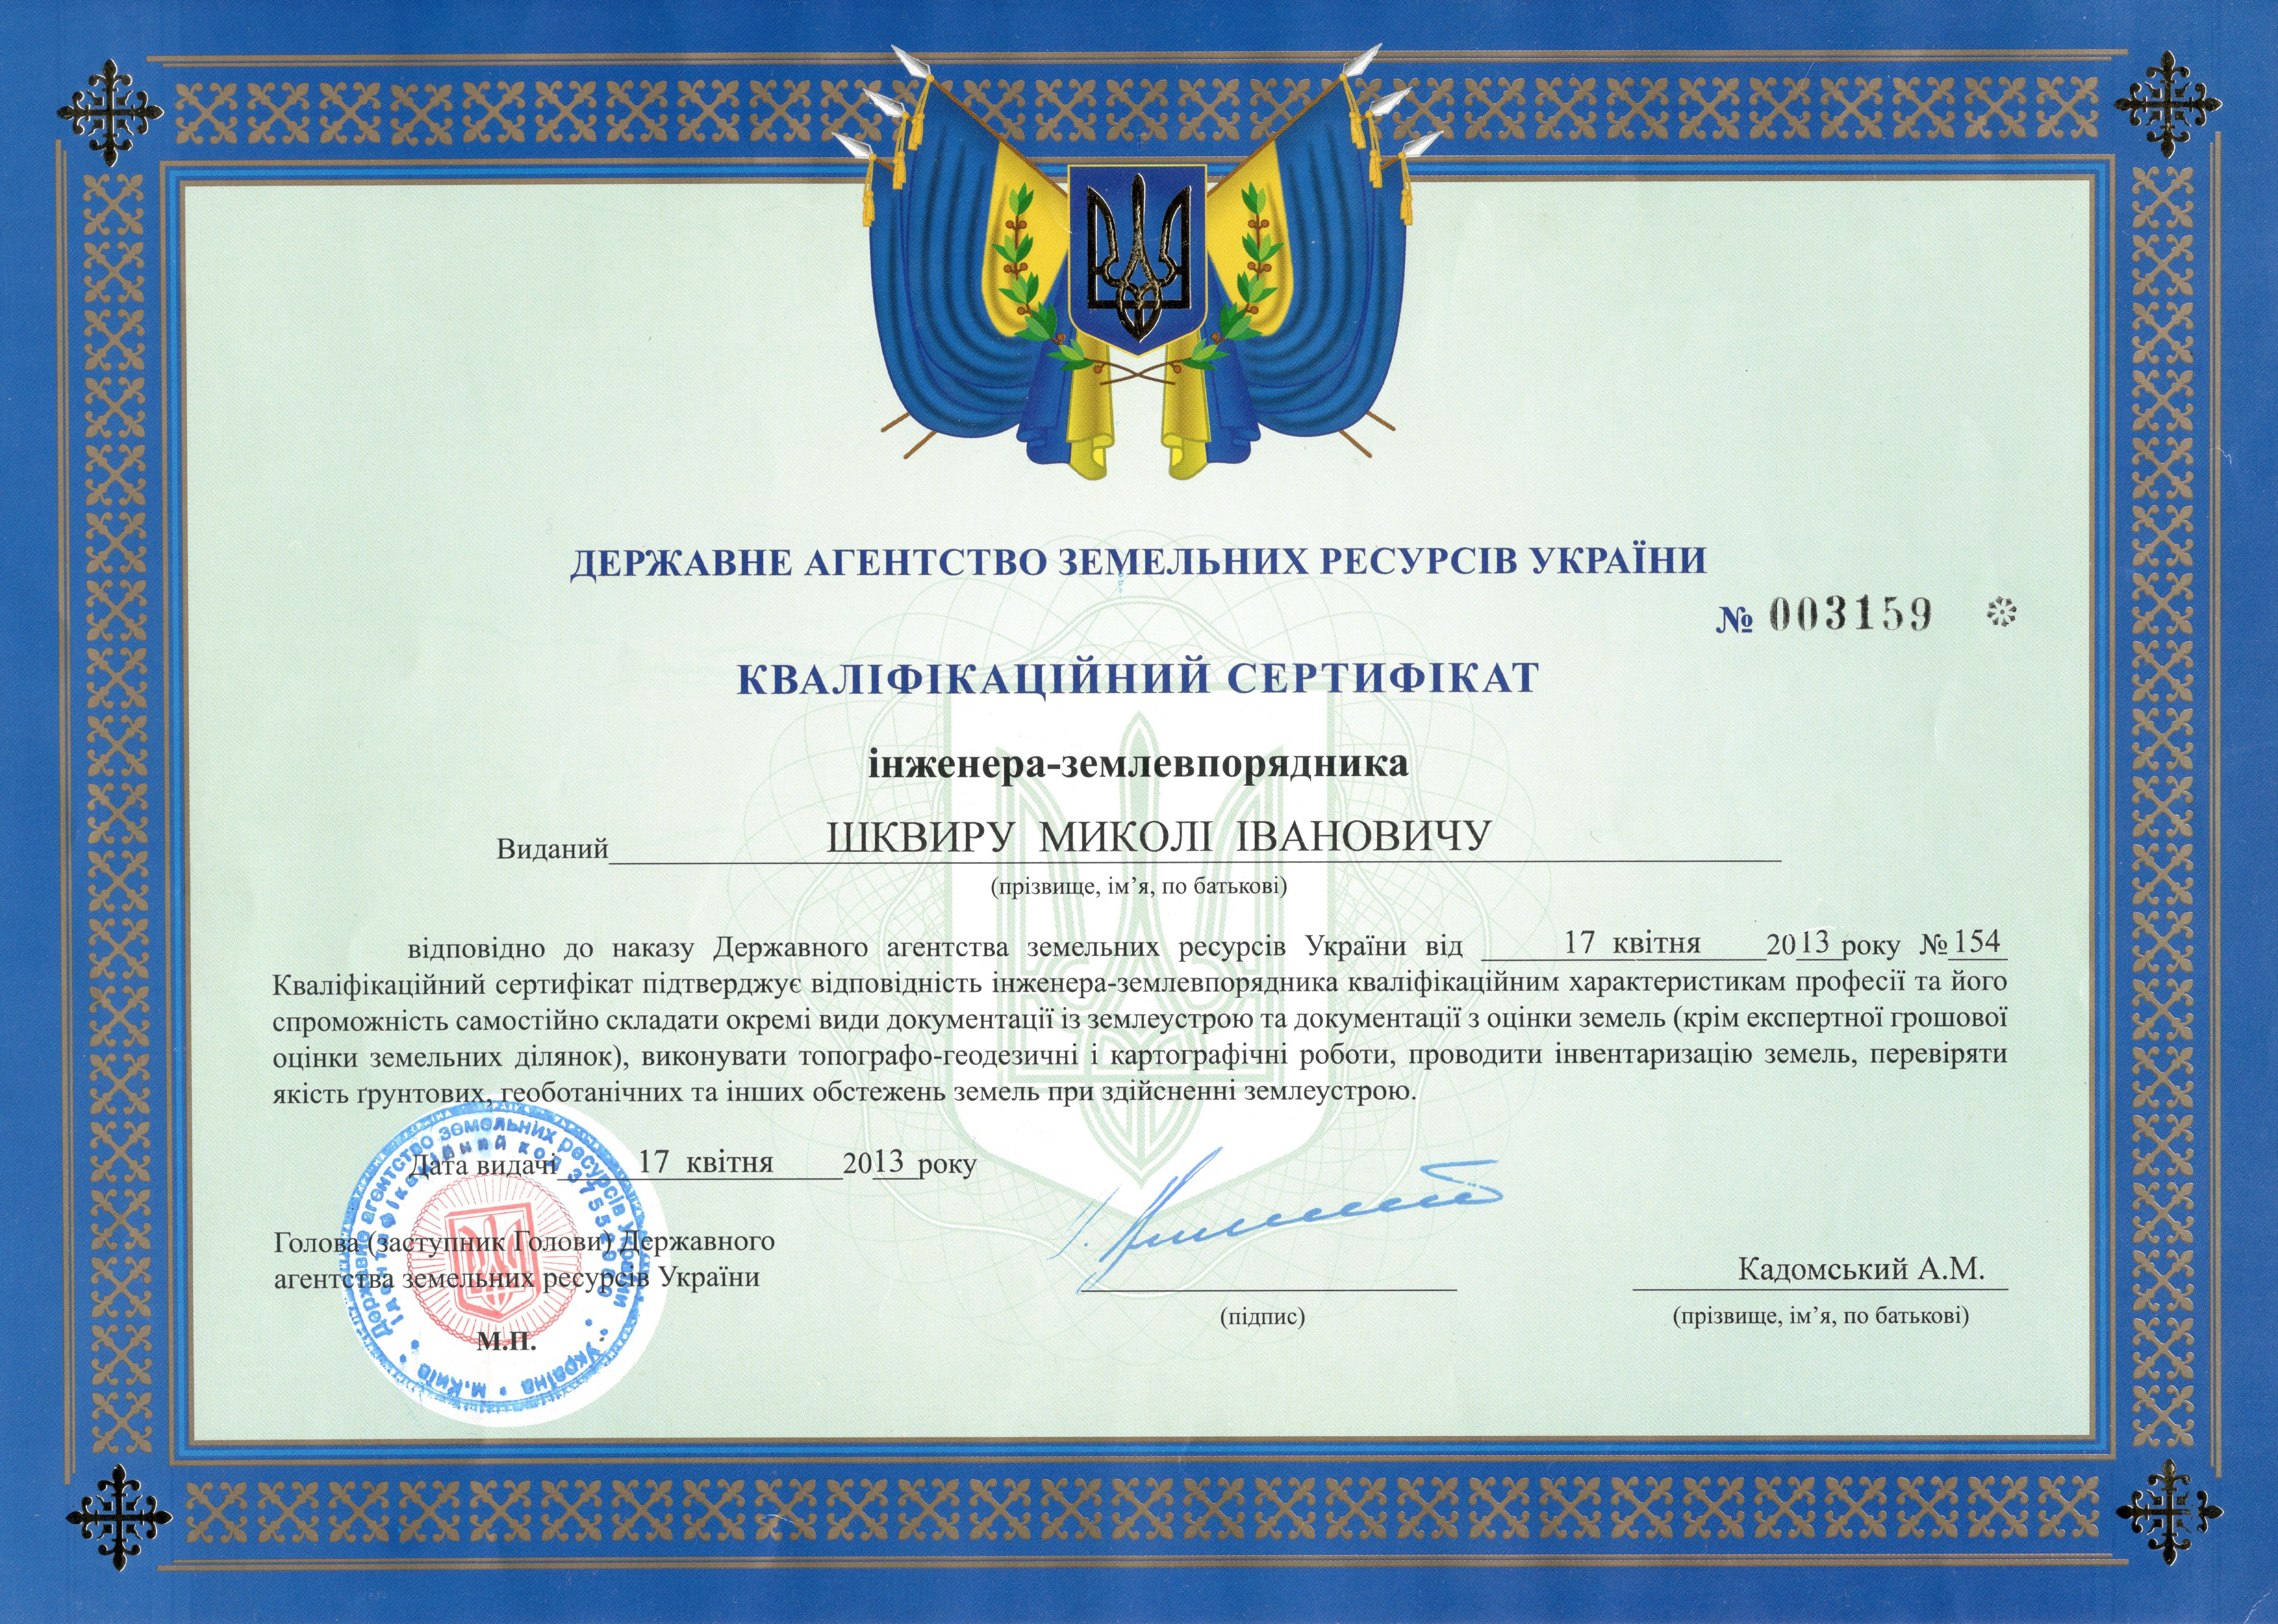 http://www.geosektor.com/wp-content/uploads/2017/03/Sertifikat-SHkvir-M.I.-e1488364876541.jpg